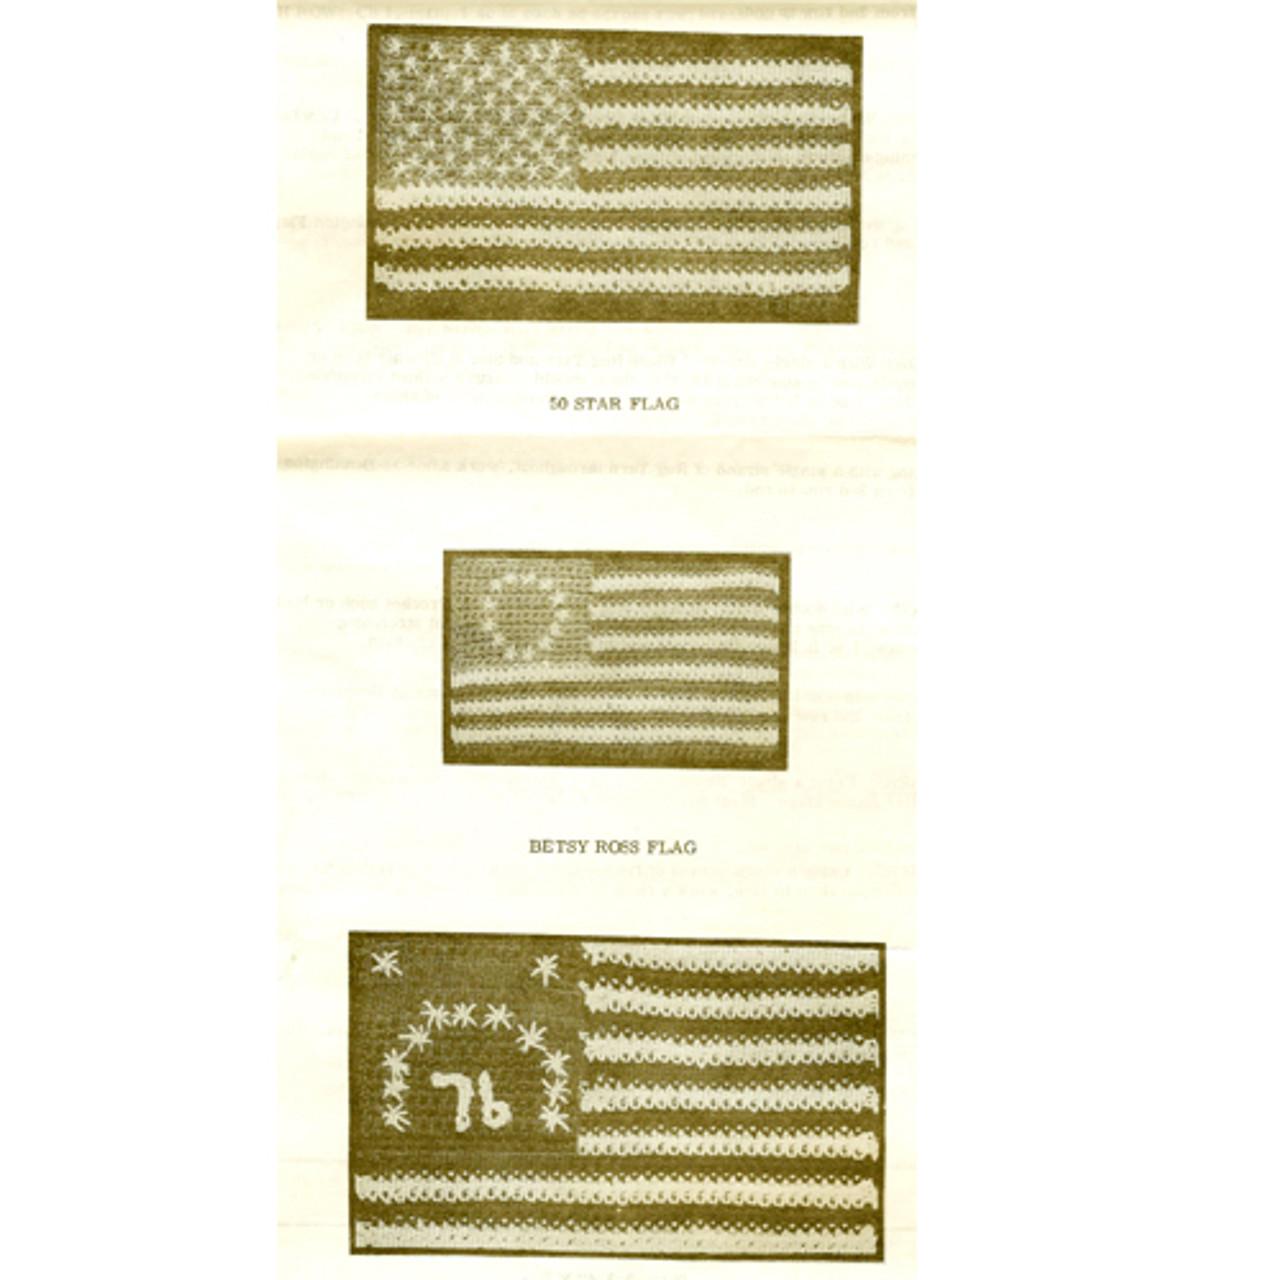 Three Crocheted American Flags